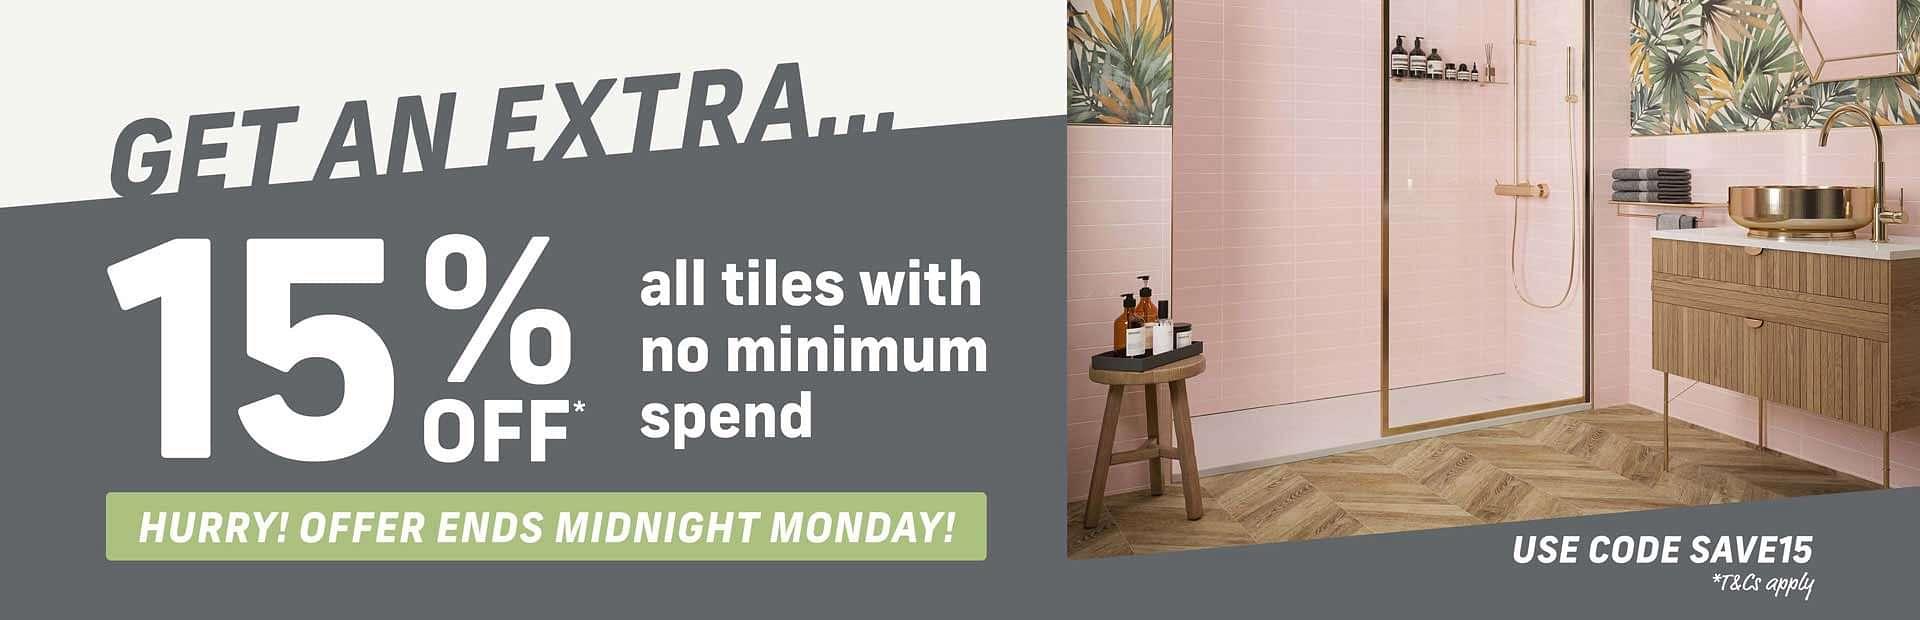 Great Savings at Tile Giant!